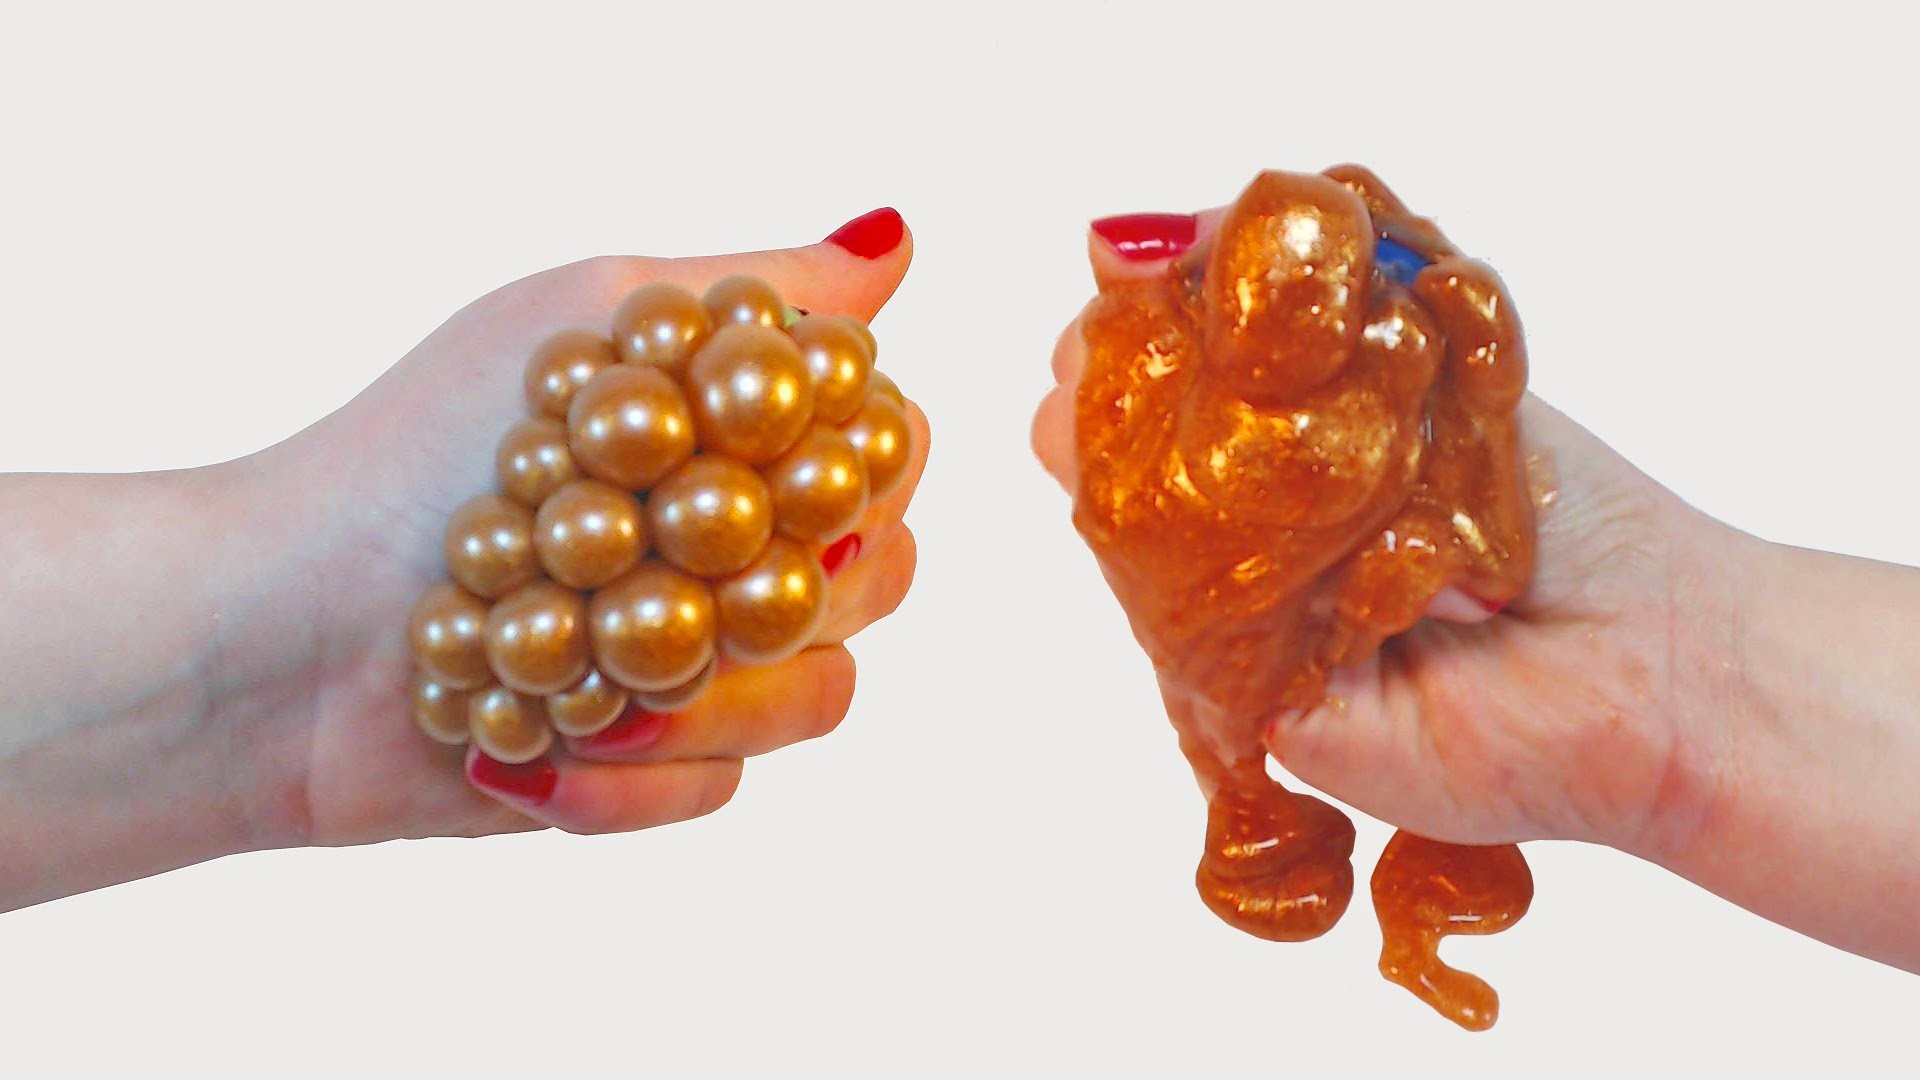 DIY Metallic 'Rusty' Slime Stress Ball & Cutting It Open